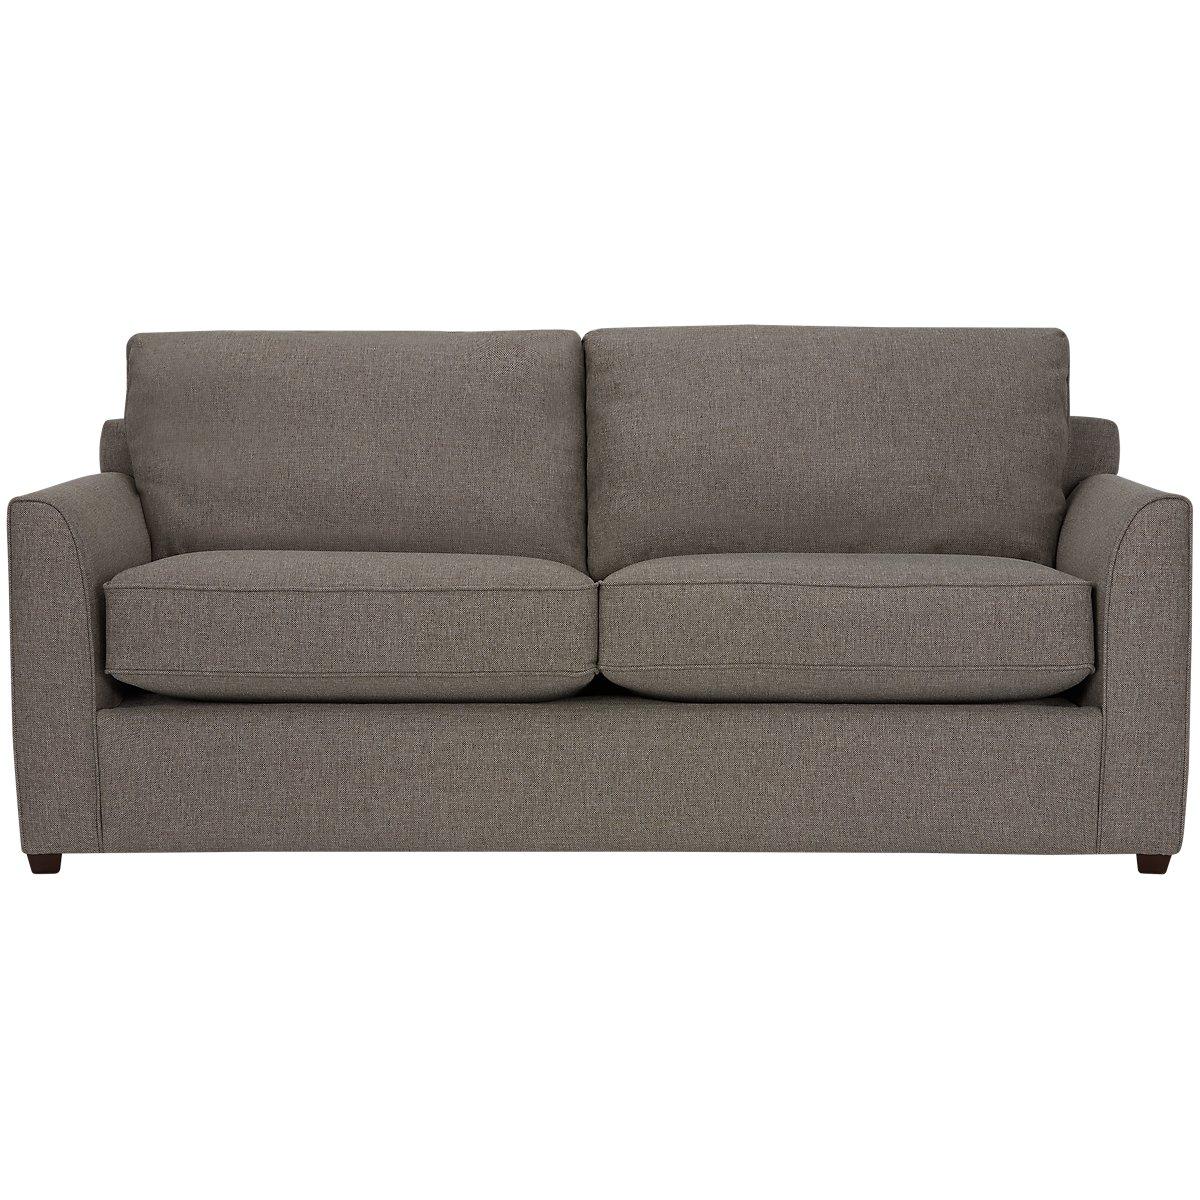 Asheville Brown Fabric Sofa